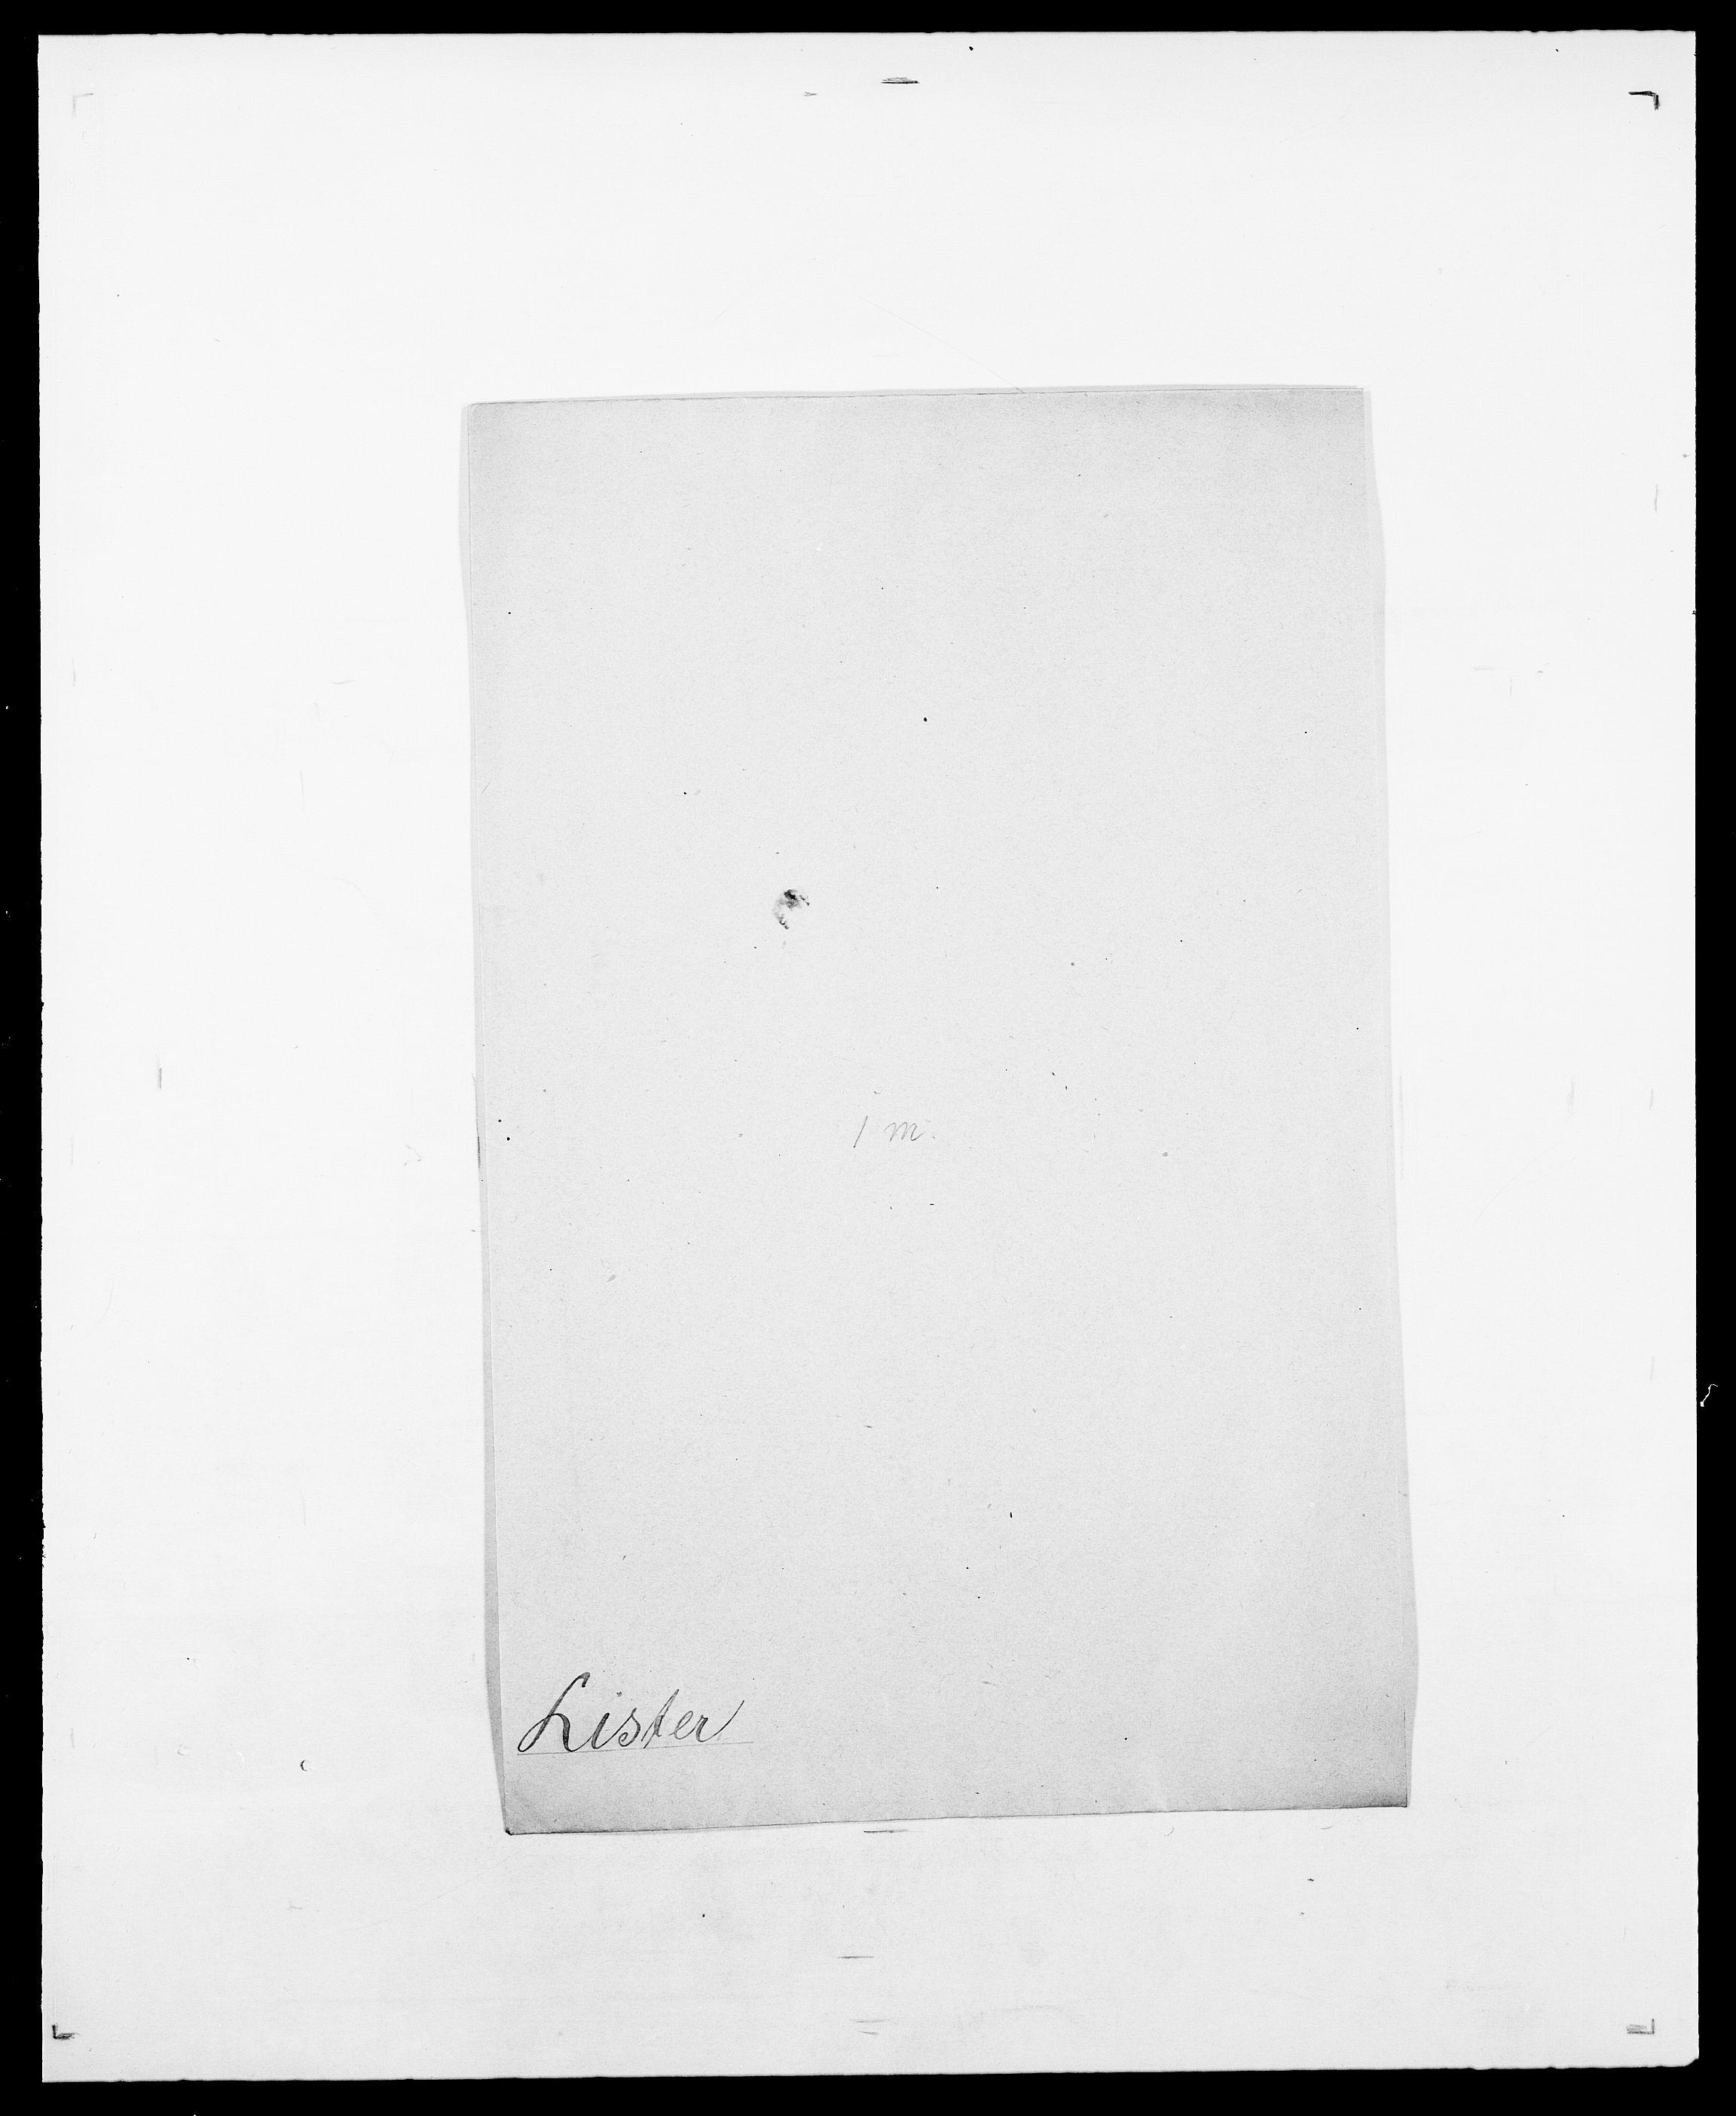 SAO, Delgobe, Charles Antoine - samling, D/Da/L0023: Lau - Lirvyn, s. 699